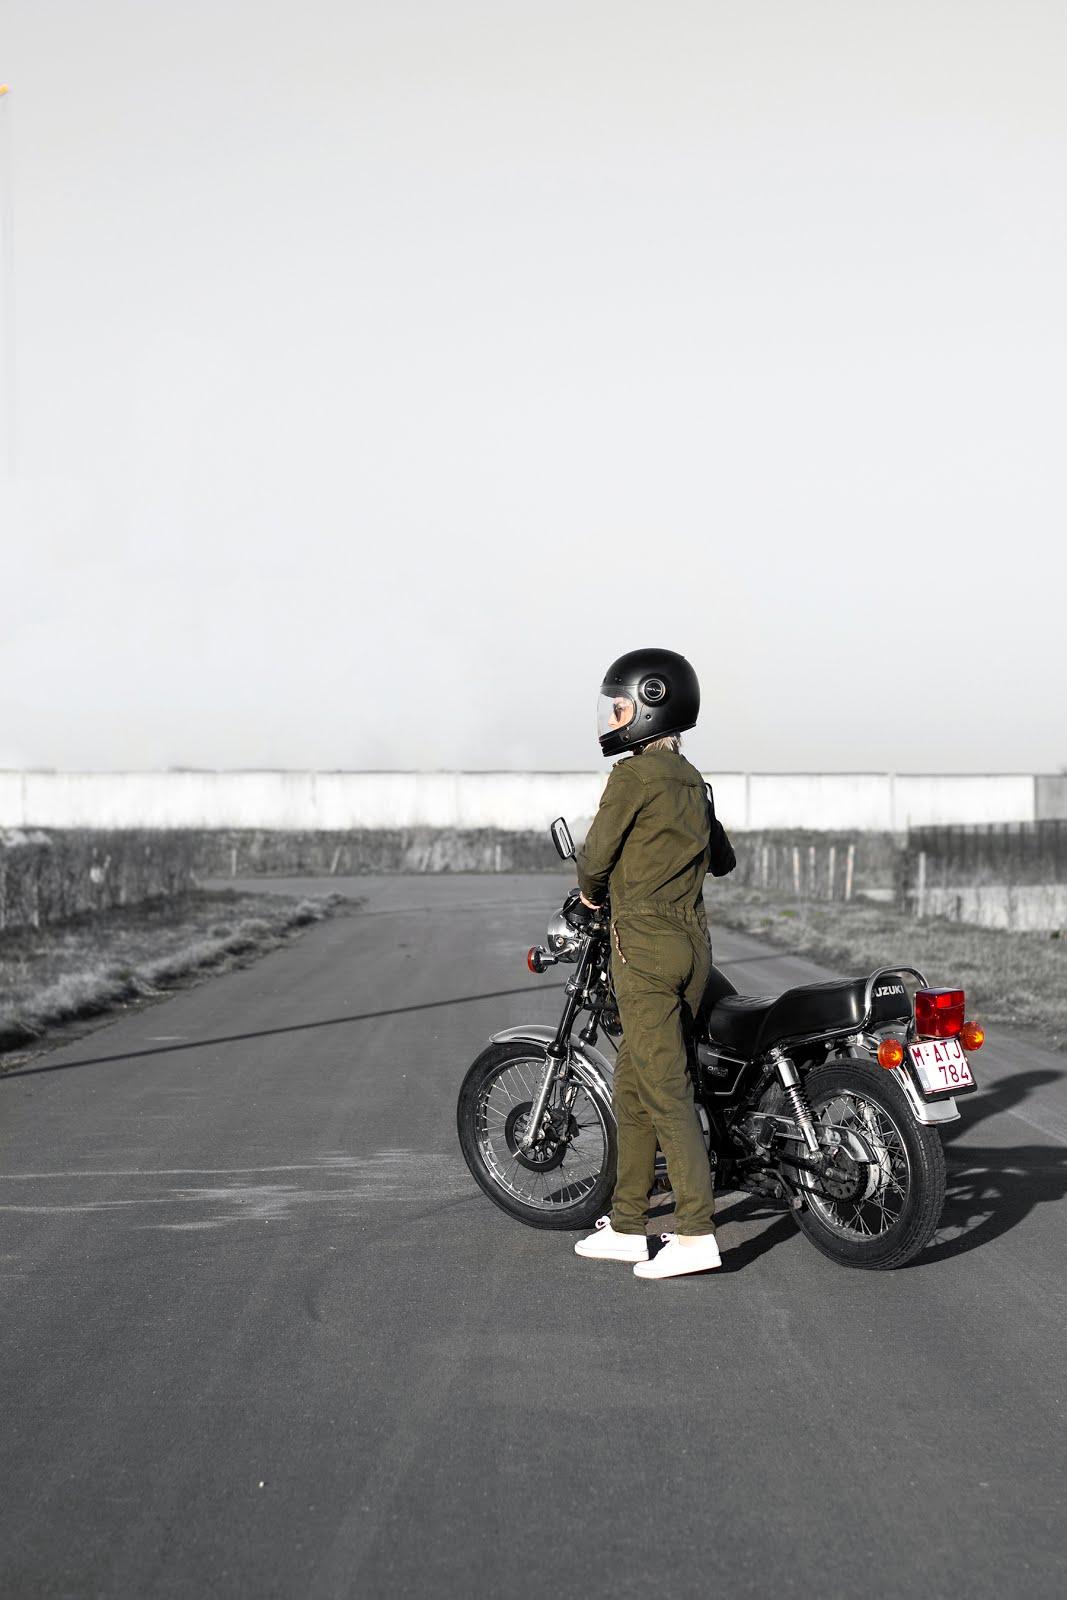 s.oliver, global traveller, jumpsuit, boiler suit, khaki green, suzuki gn125, motorcycle, bell bullitt helmet,  outfit, street style, spring 2019